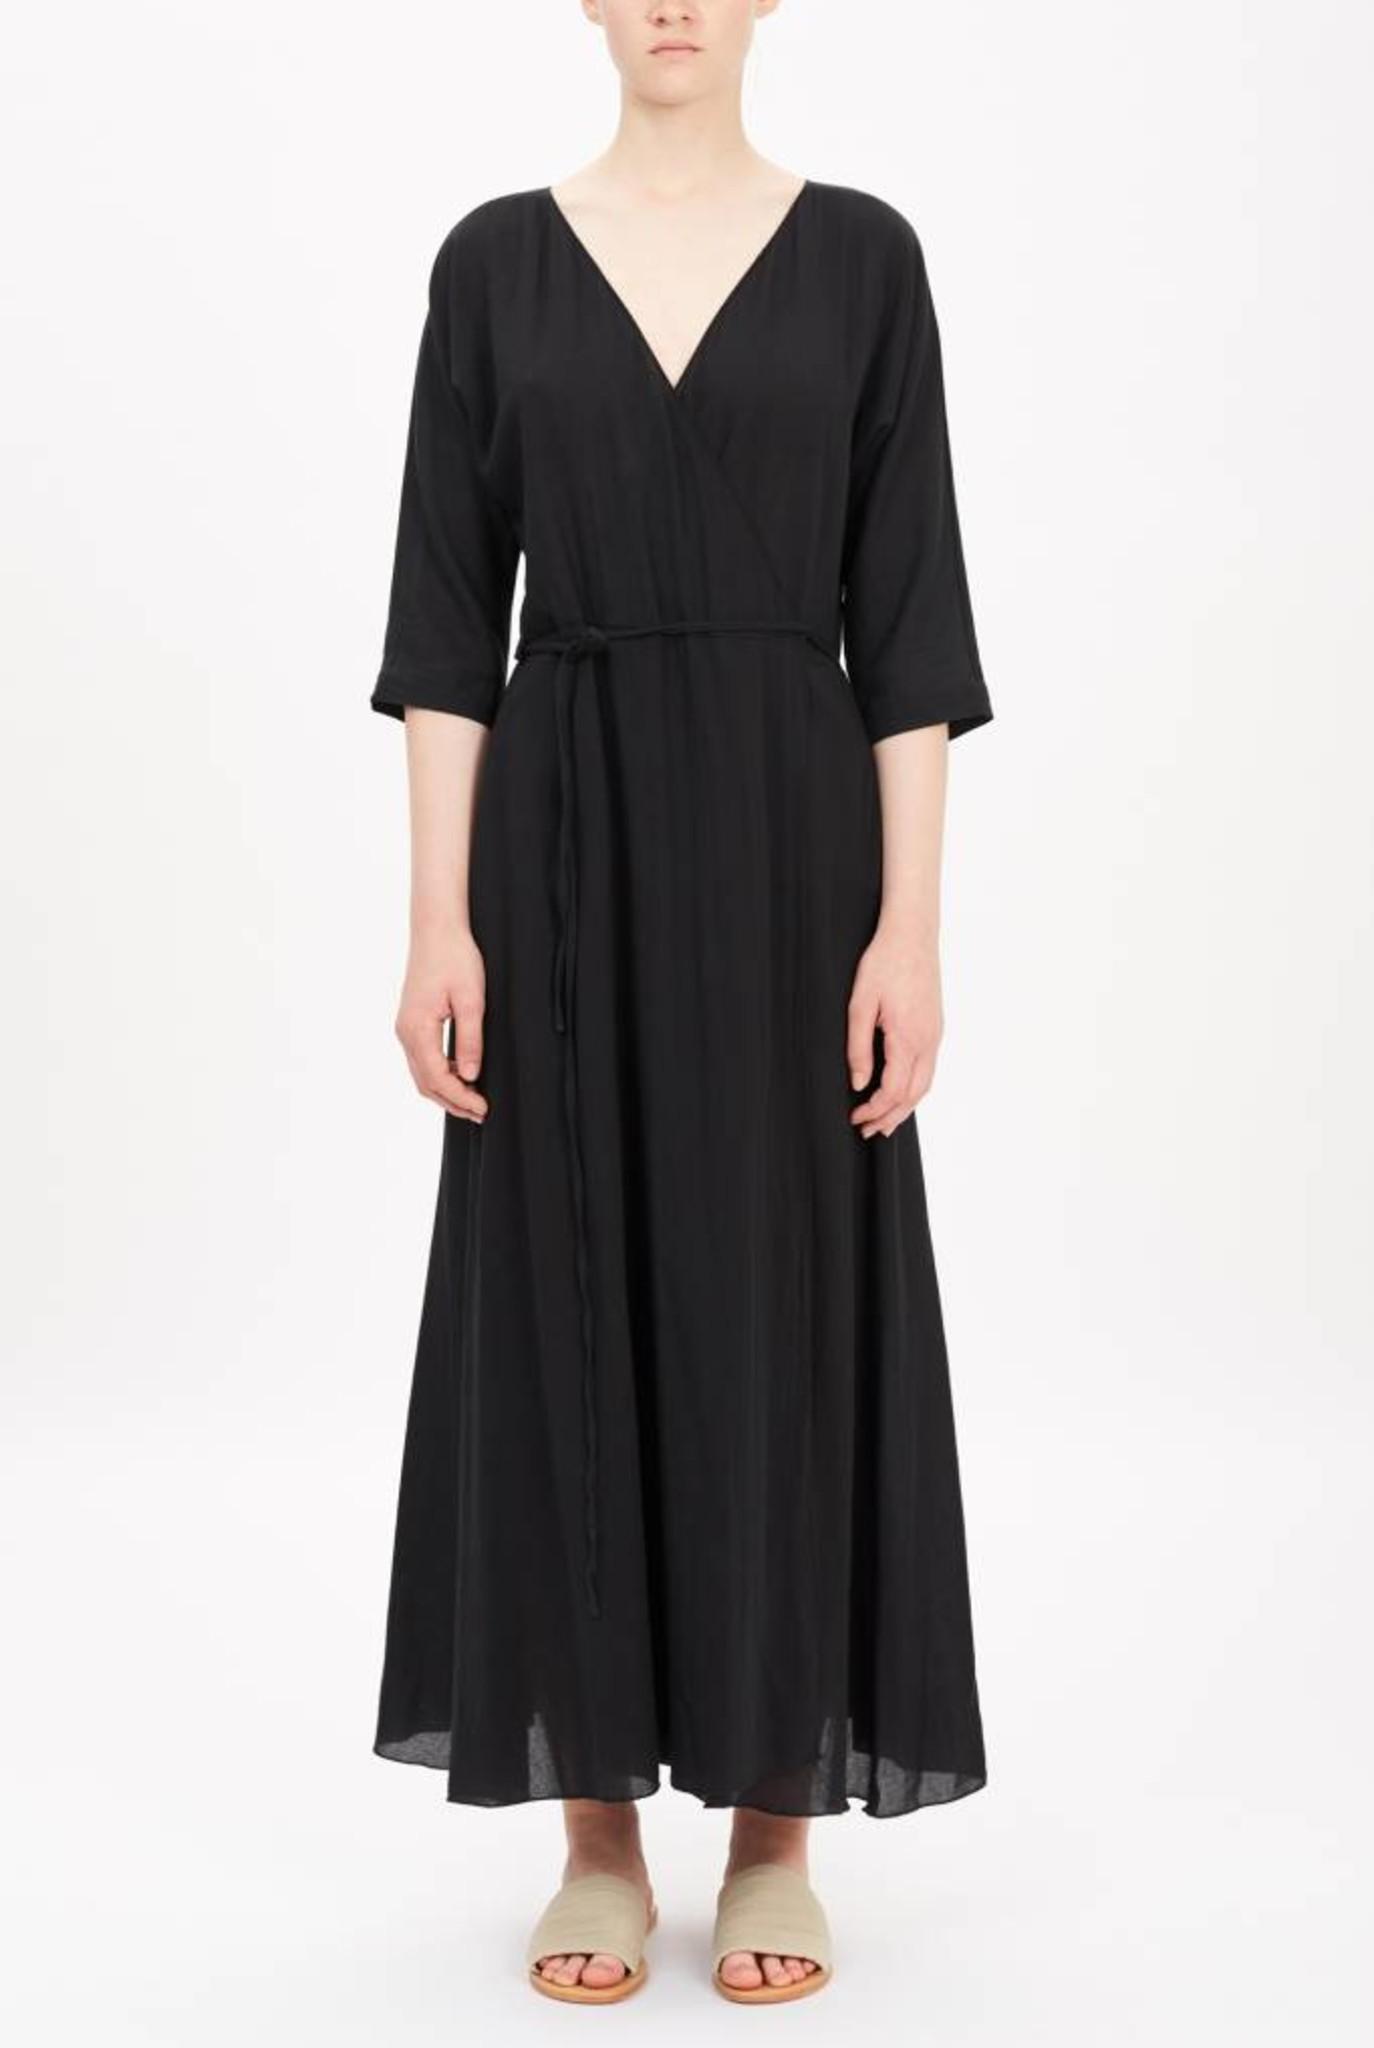 cross-over dress black cotton